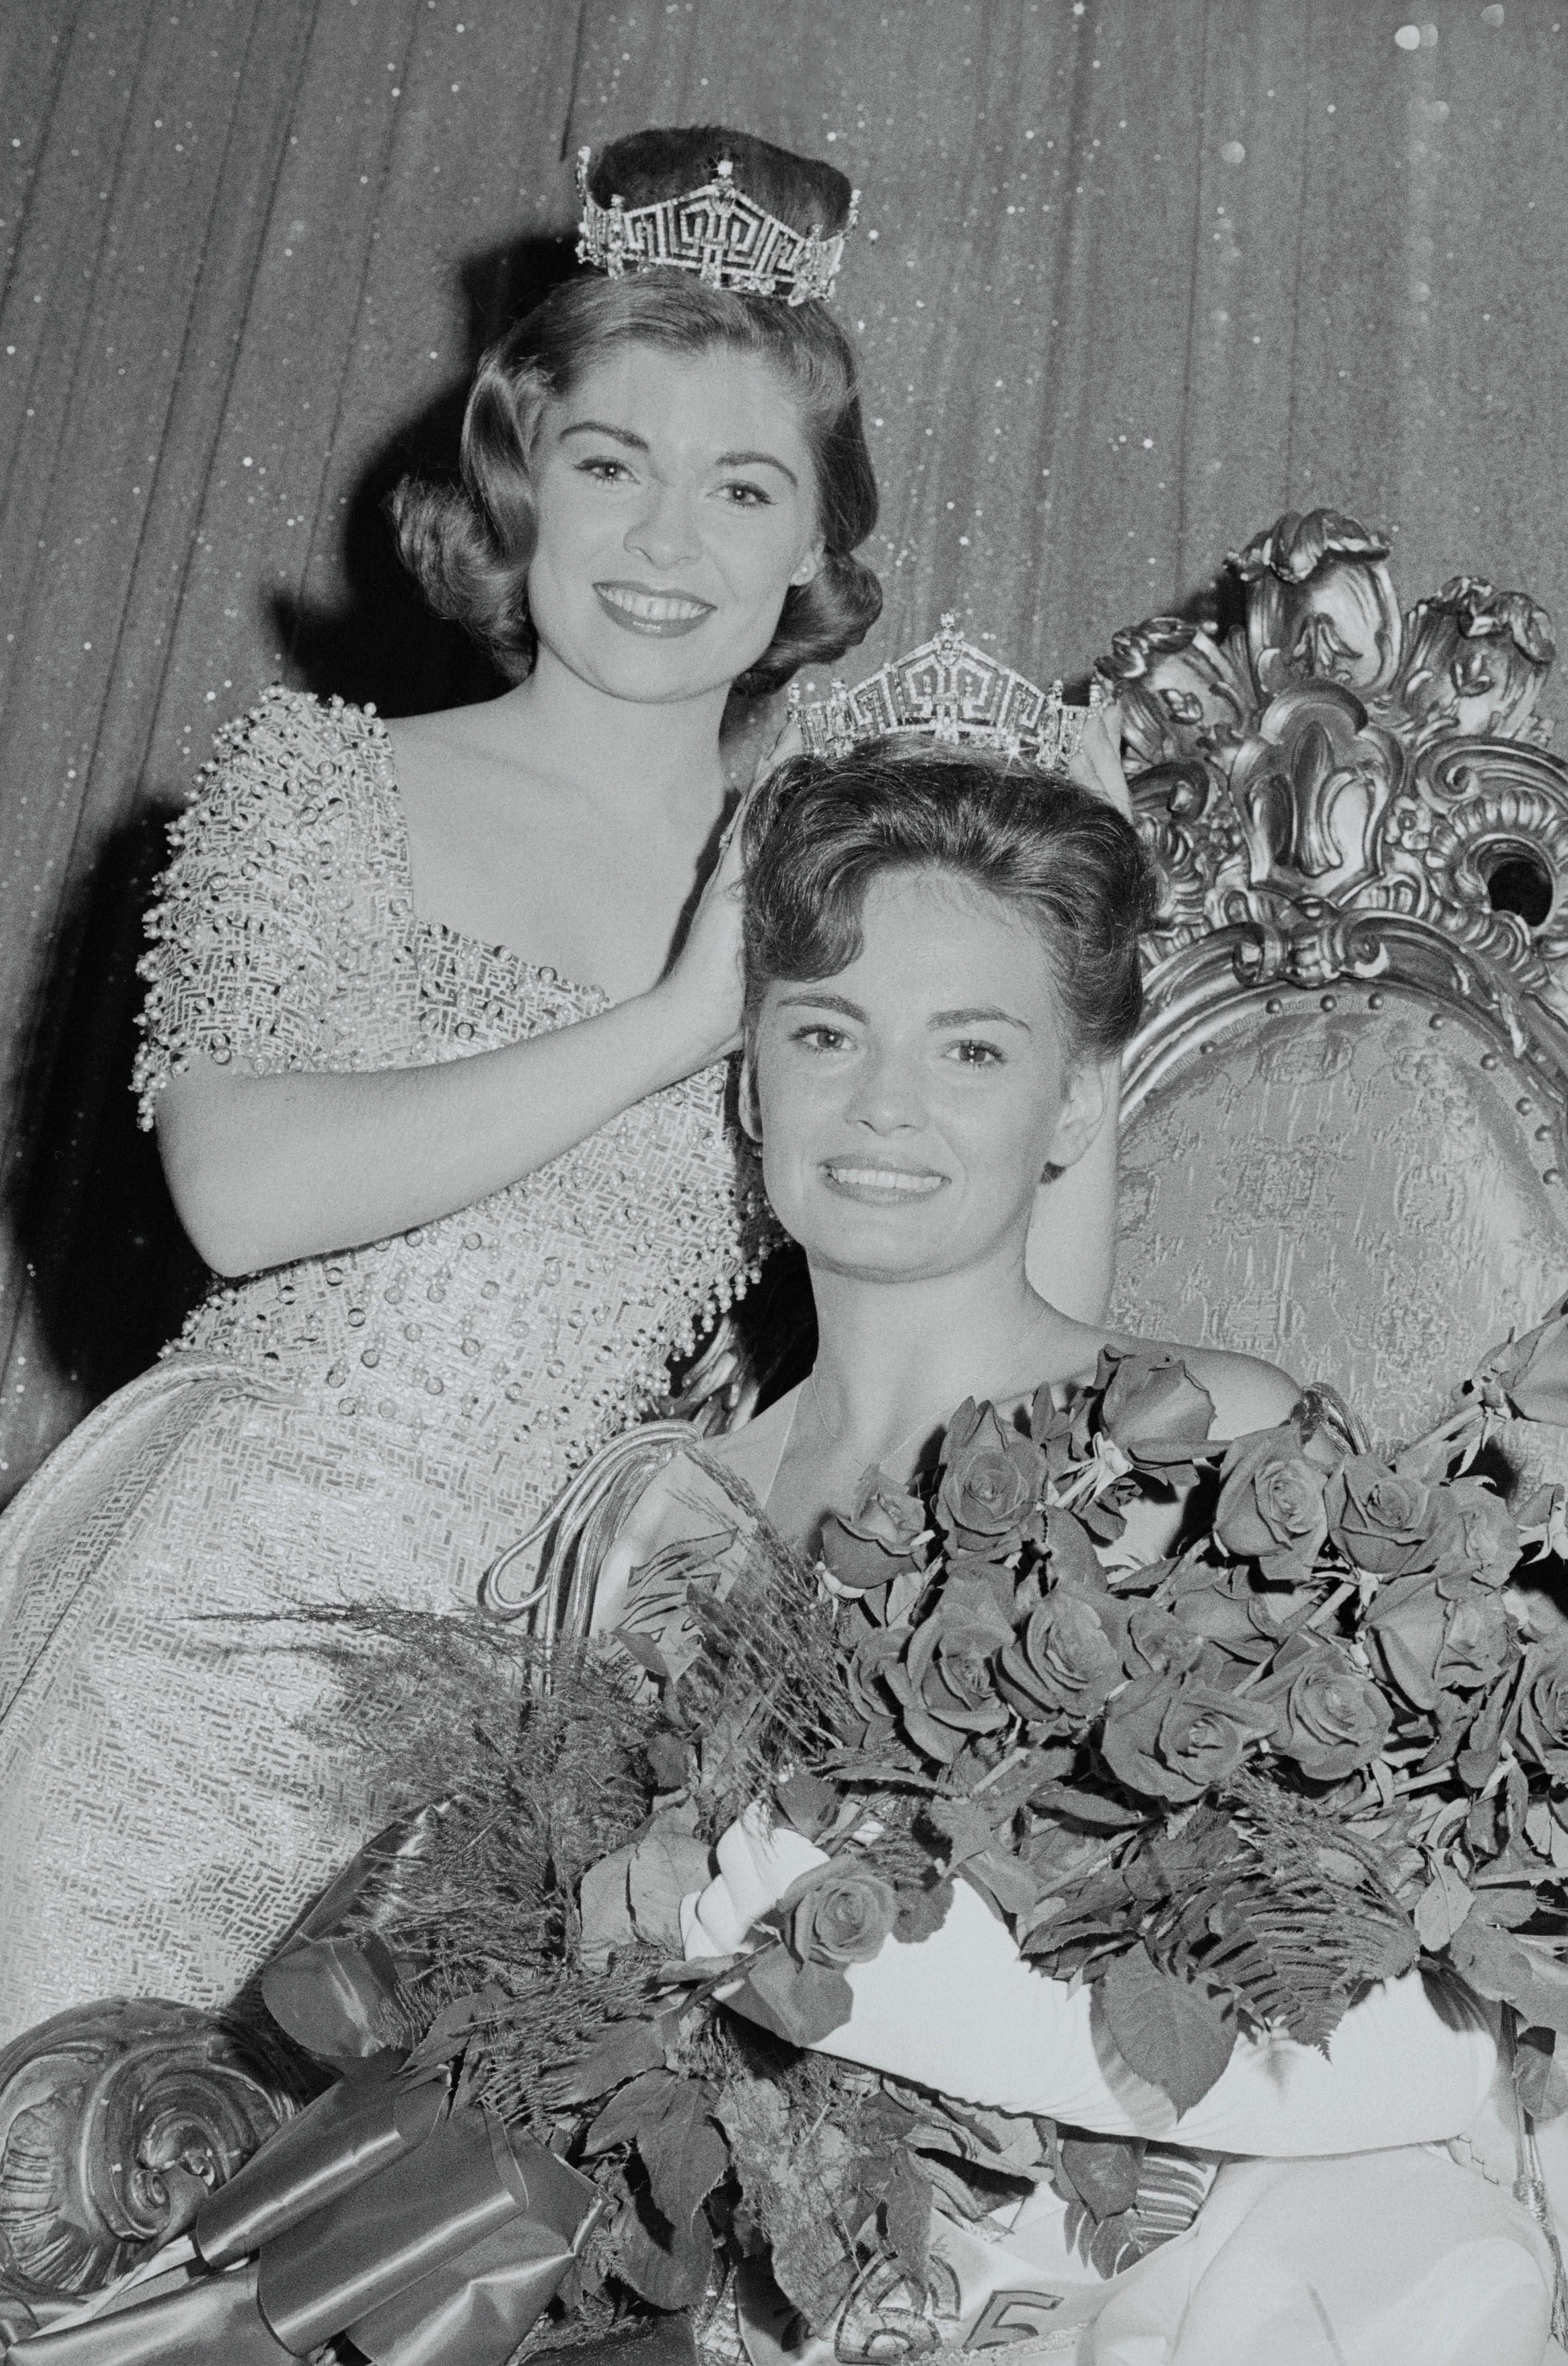 1965: Vonda Van Dyke from Phoenix